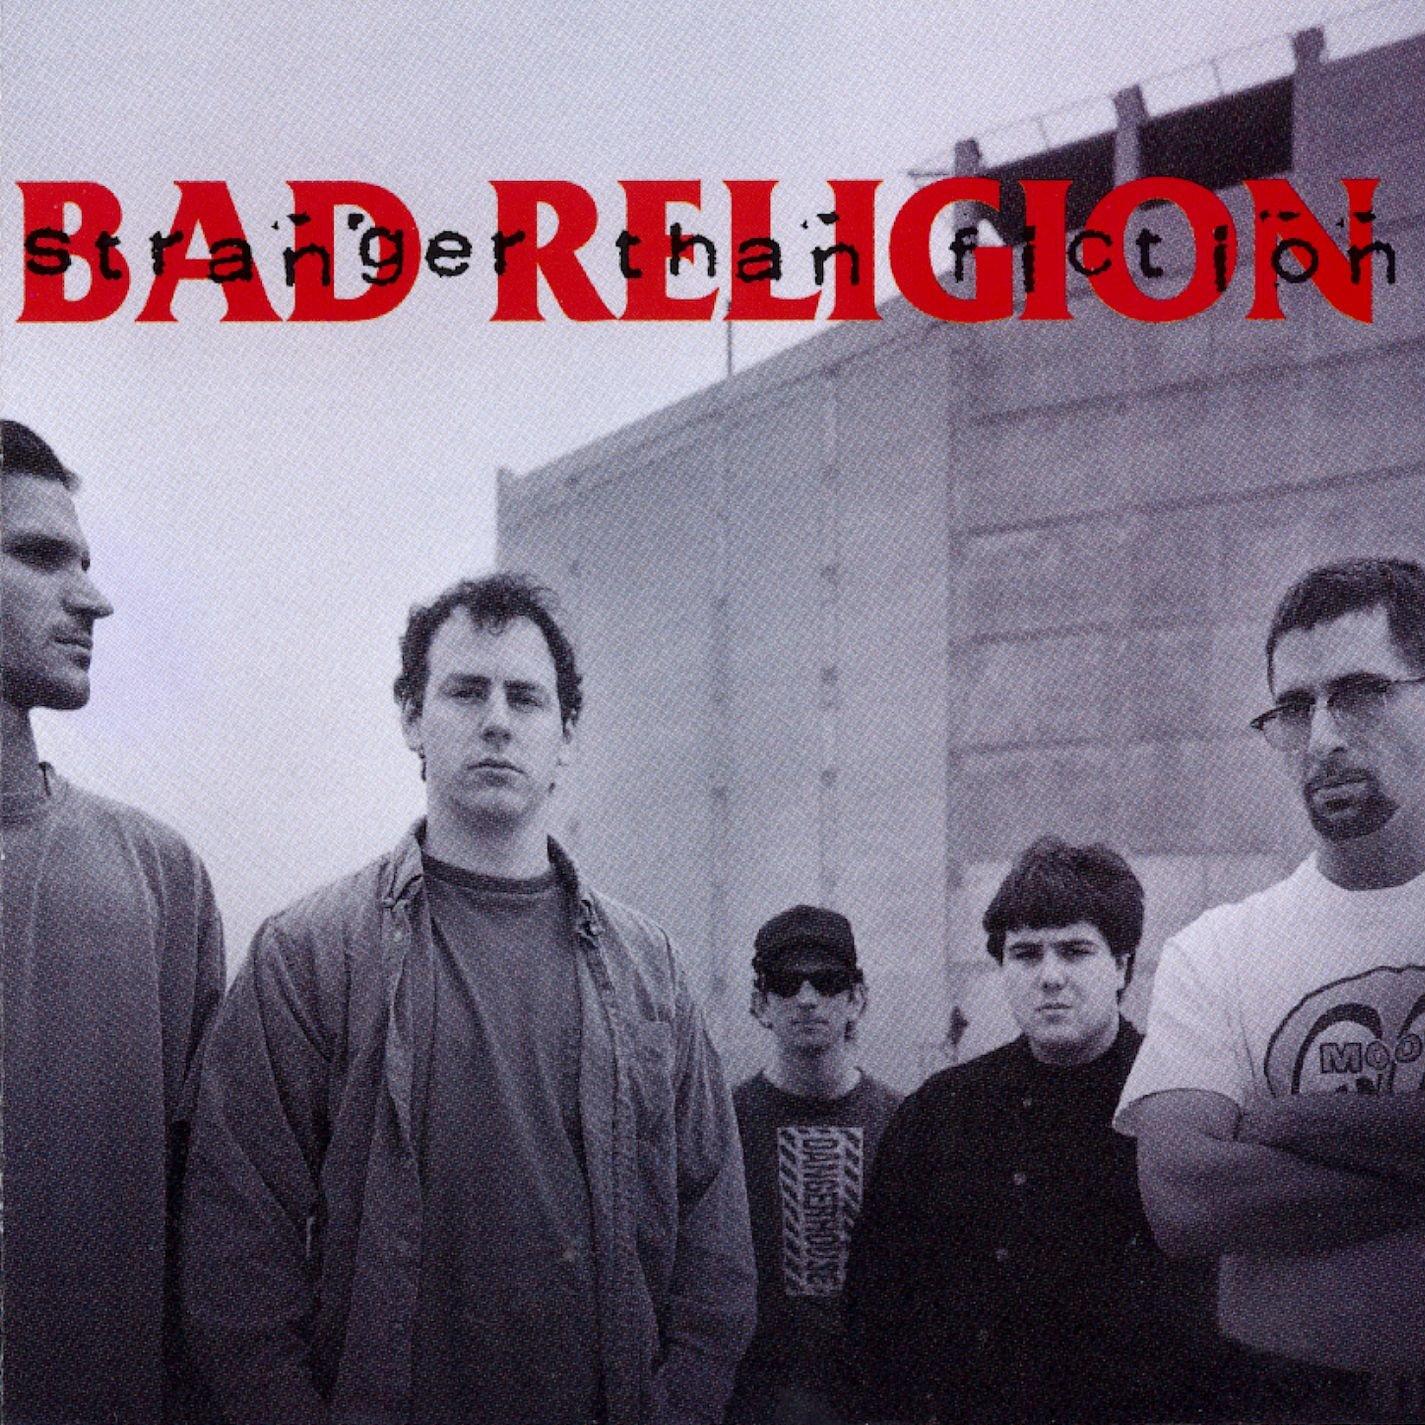 Stranger Than Fiction: Bad Religion: Amazon.es: Música